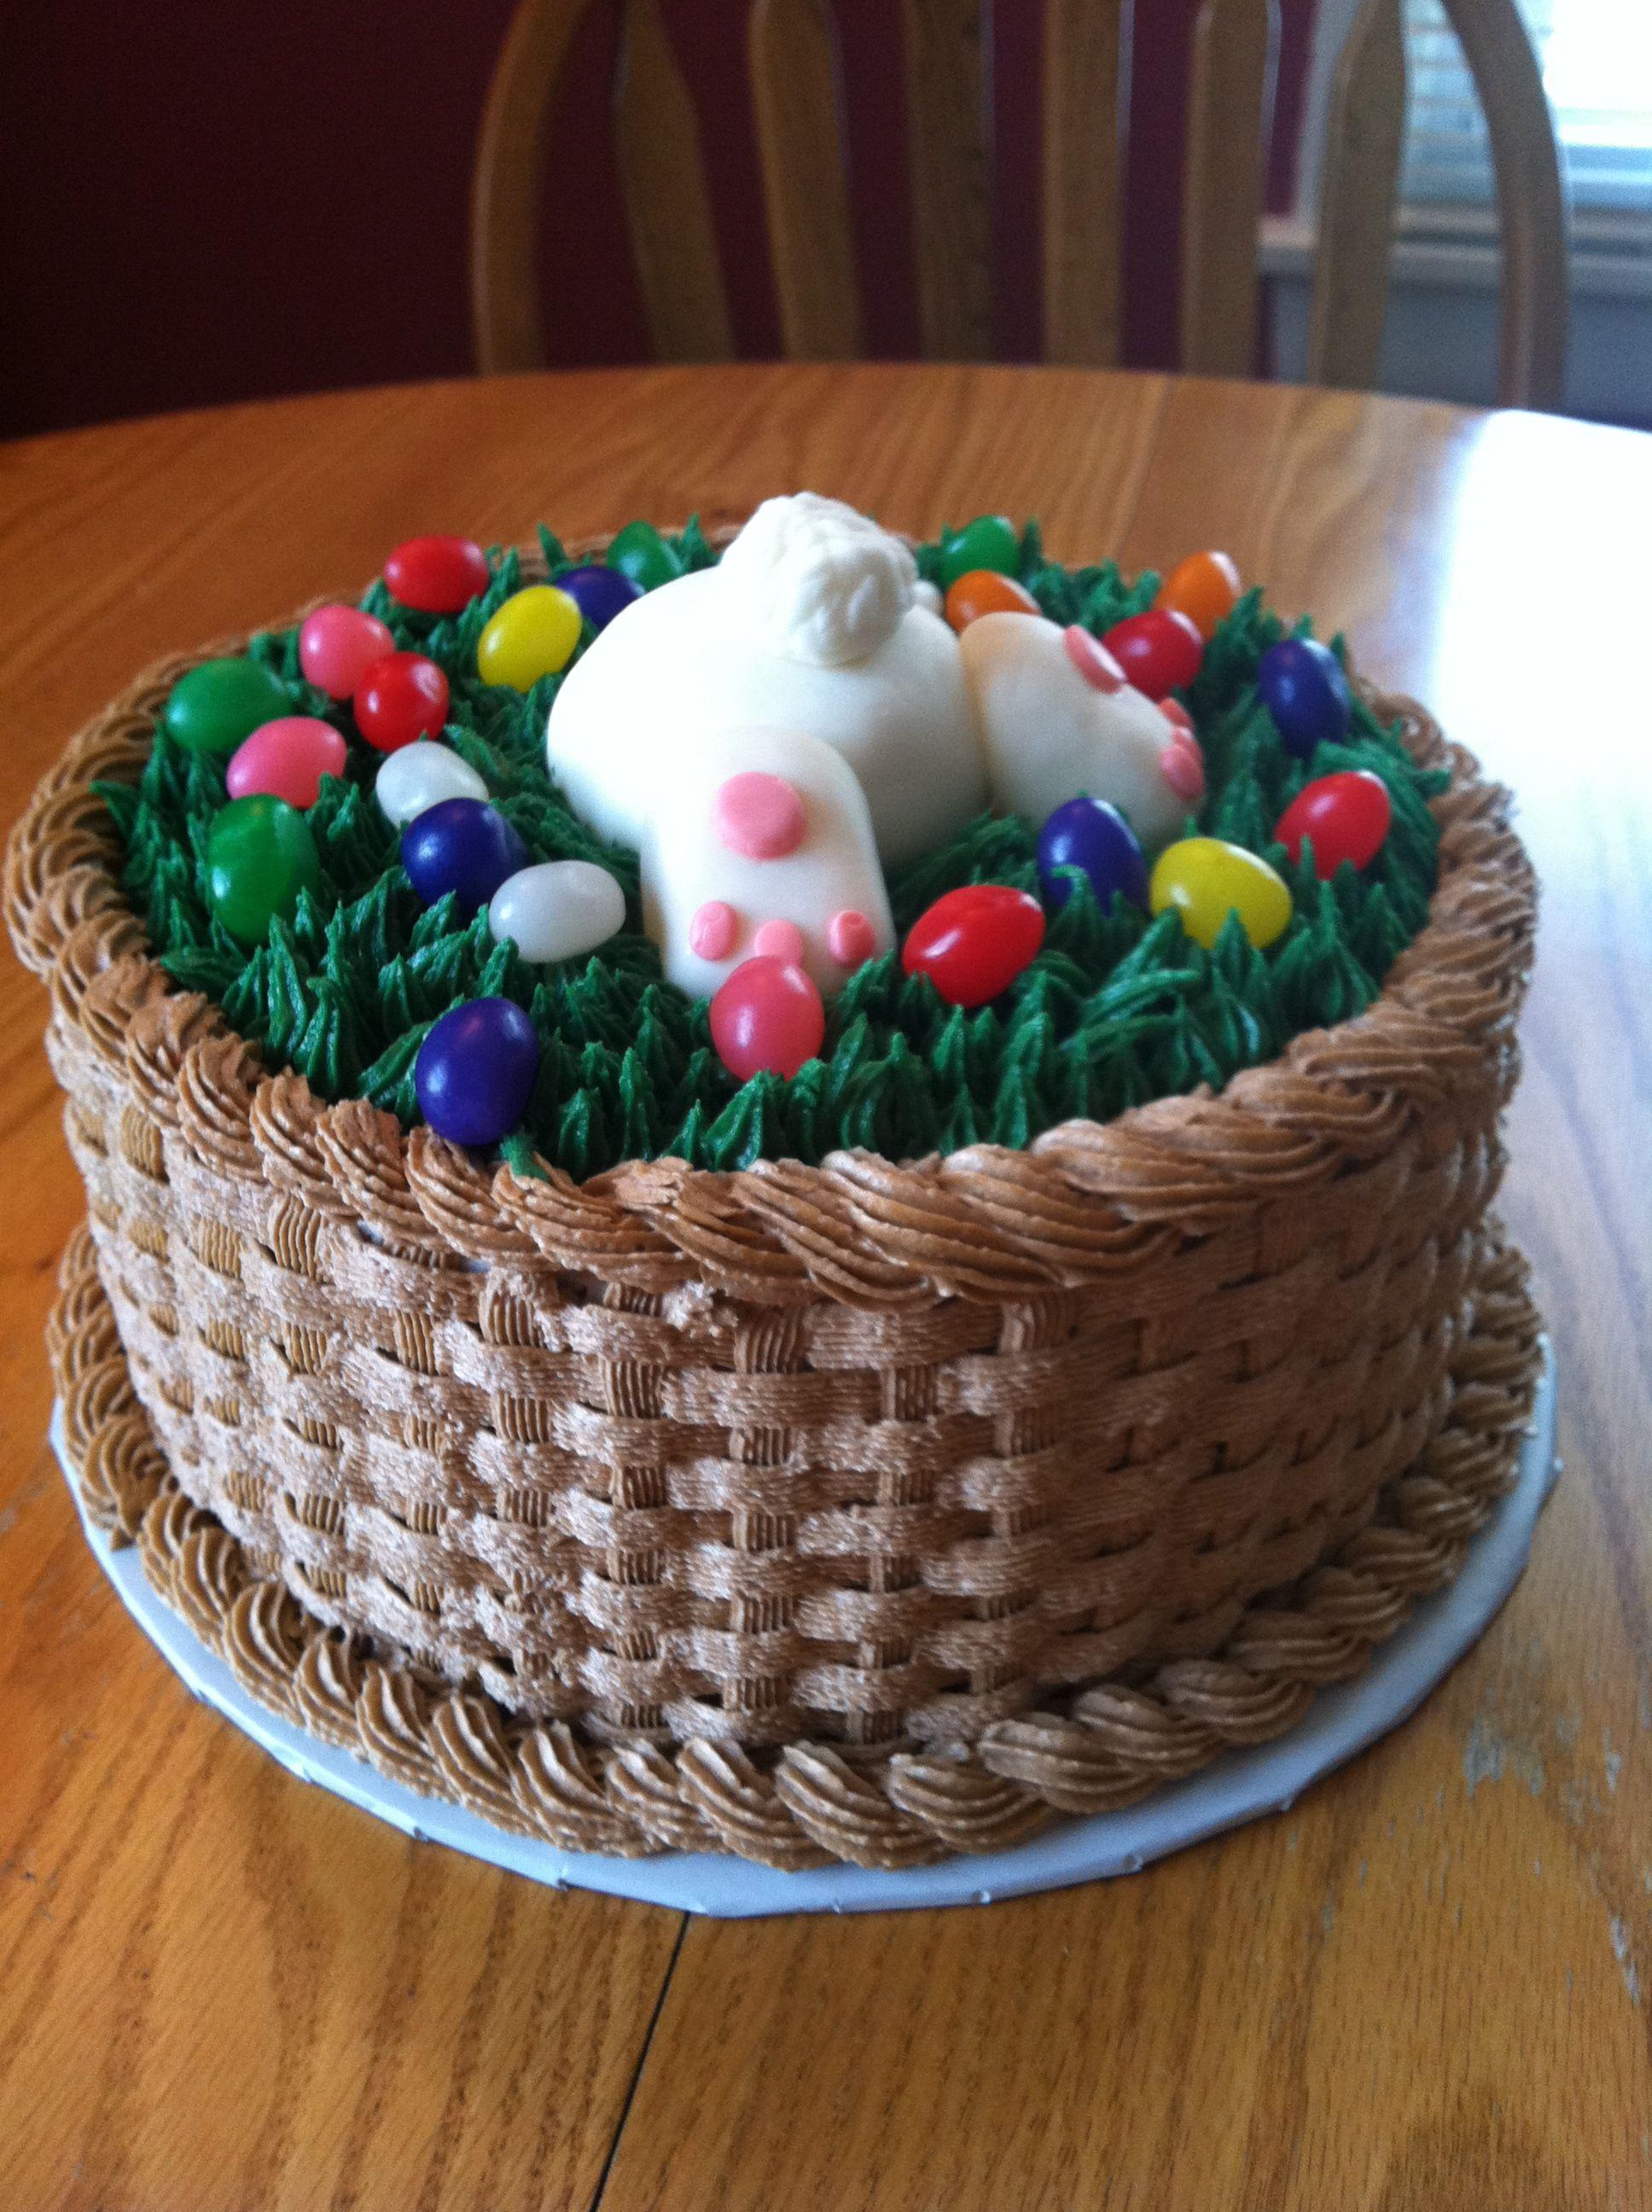 Chocolate Cake with Chocolate Malt Frosting | Recipe | Chocolate ...